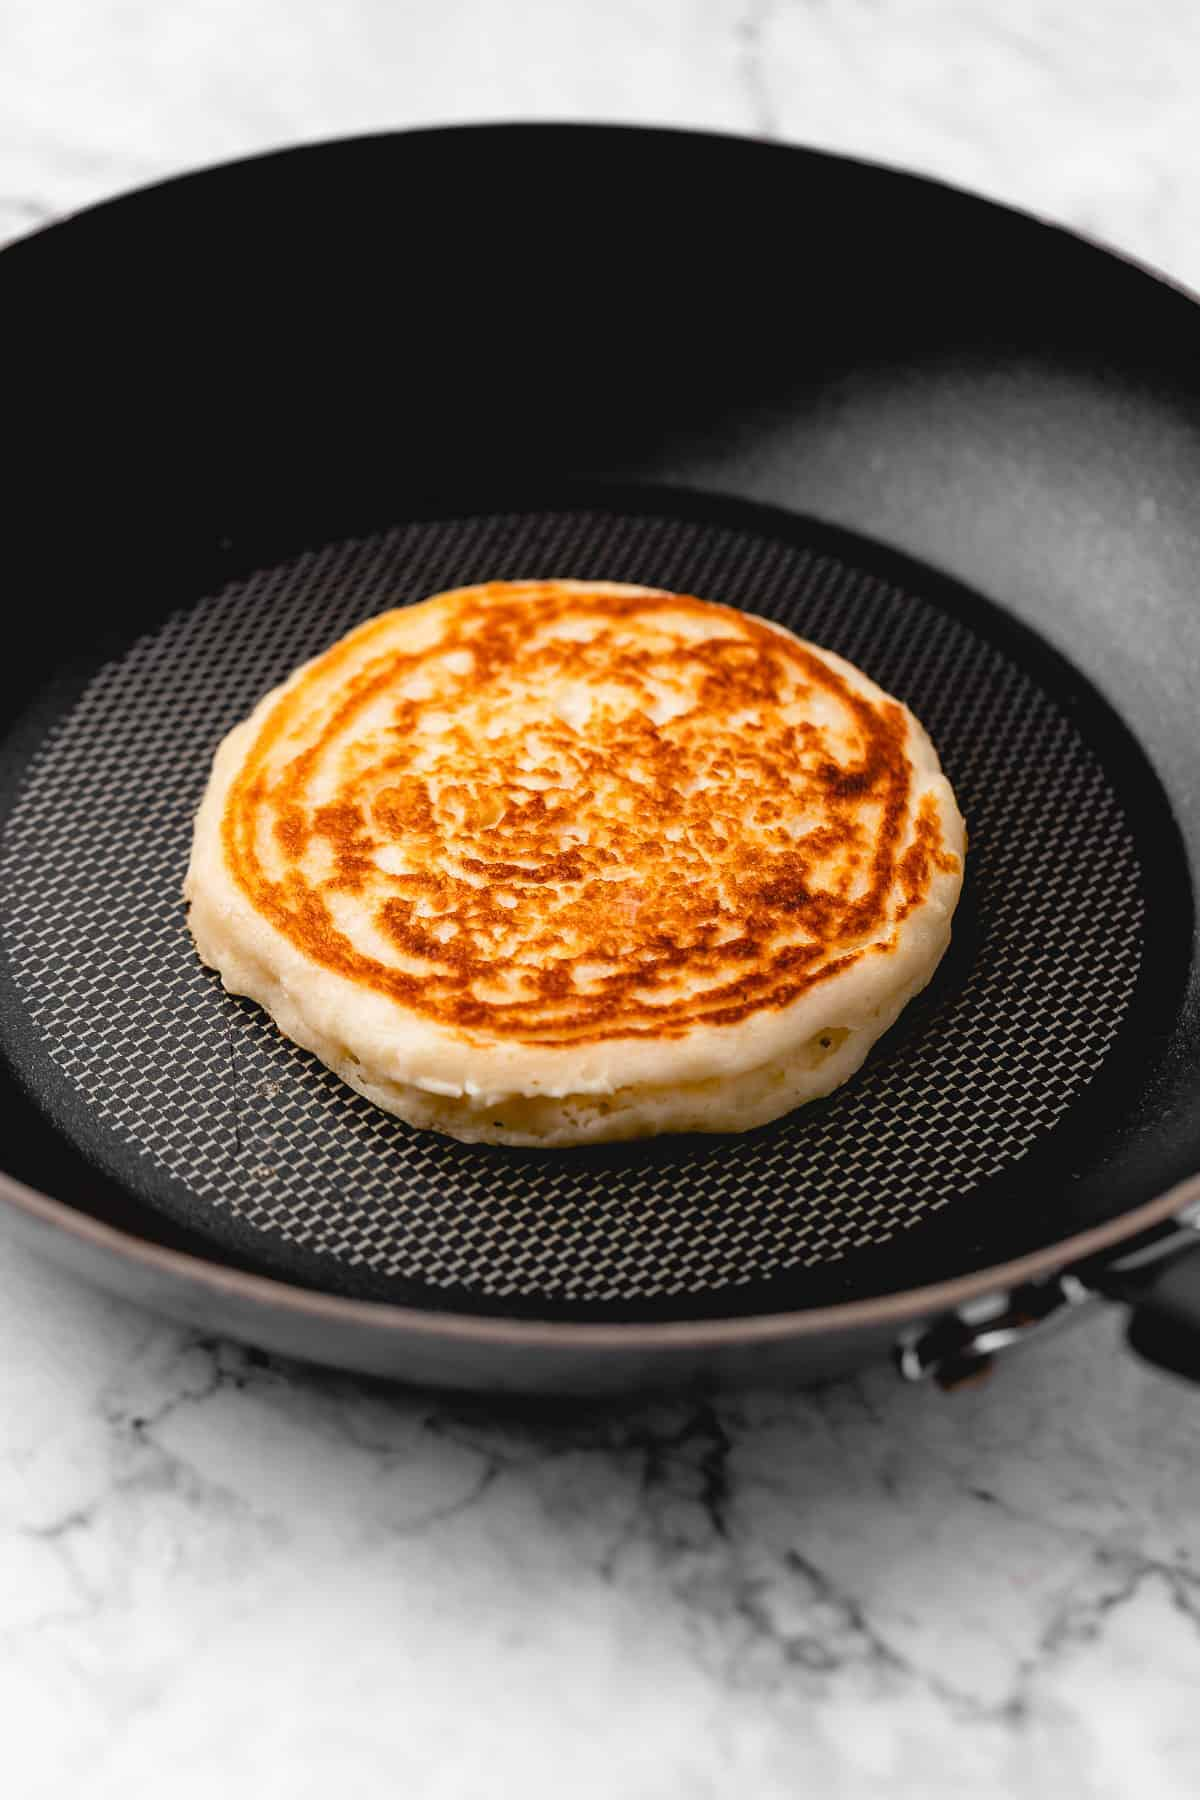 Golden brown pancake in a skillet.